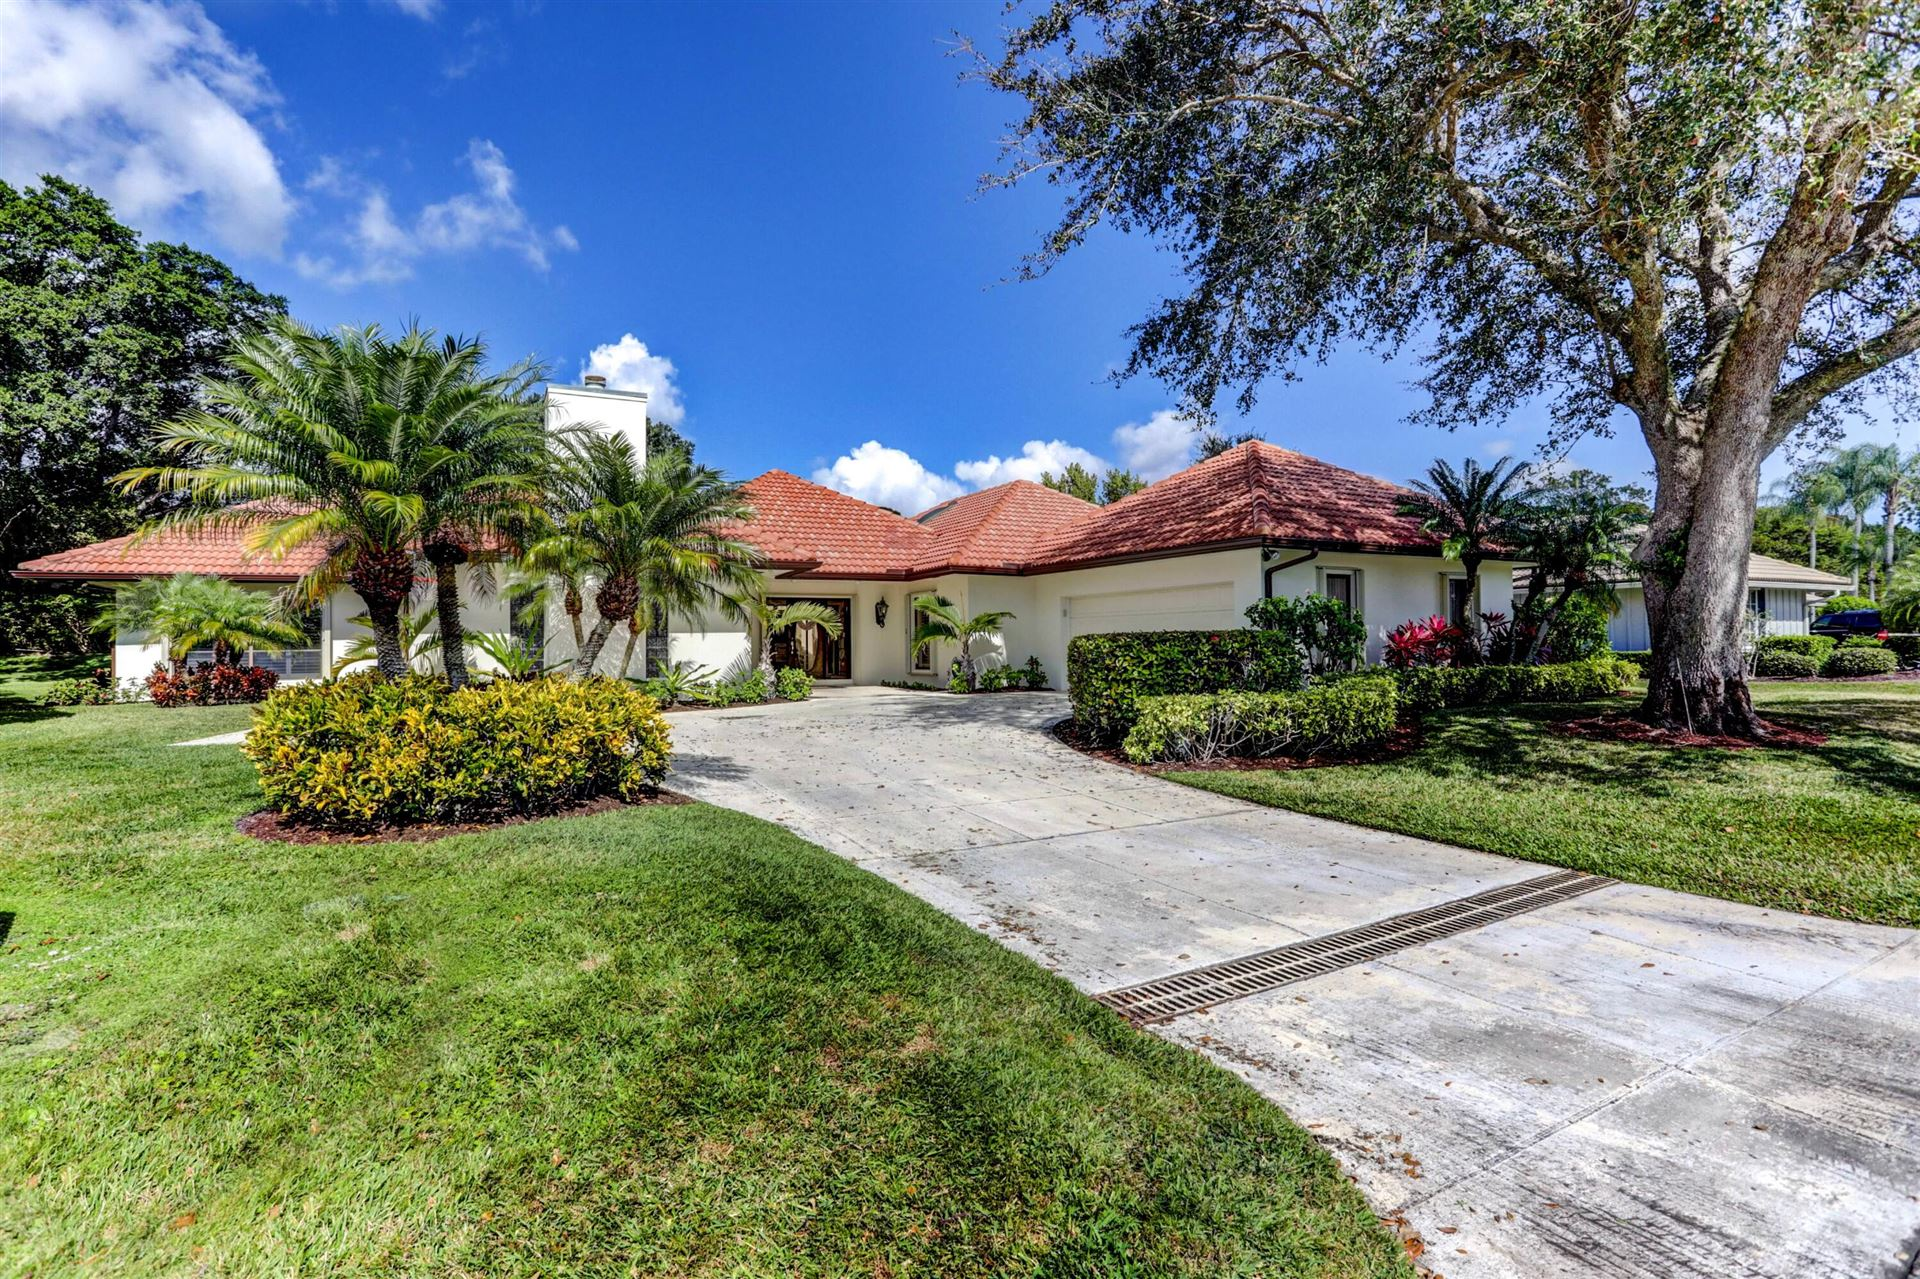 Photo of 2 Durness Court, Palm Beach Gardens, FL 33418 (MLS # RX-10690749)